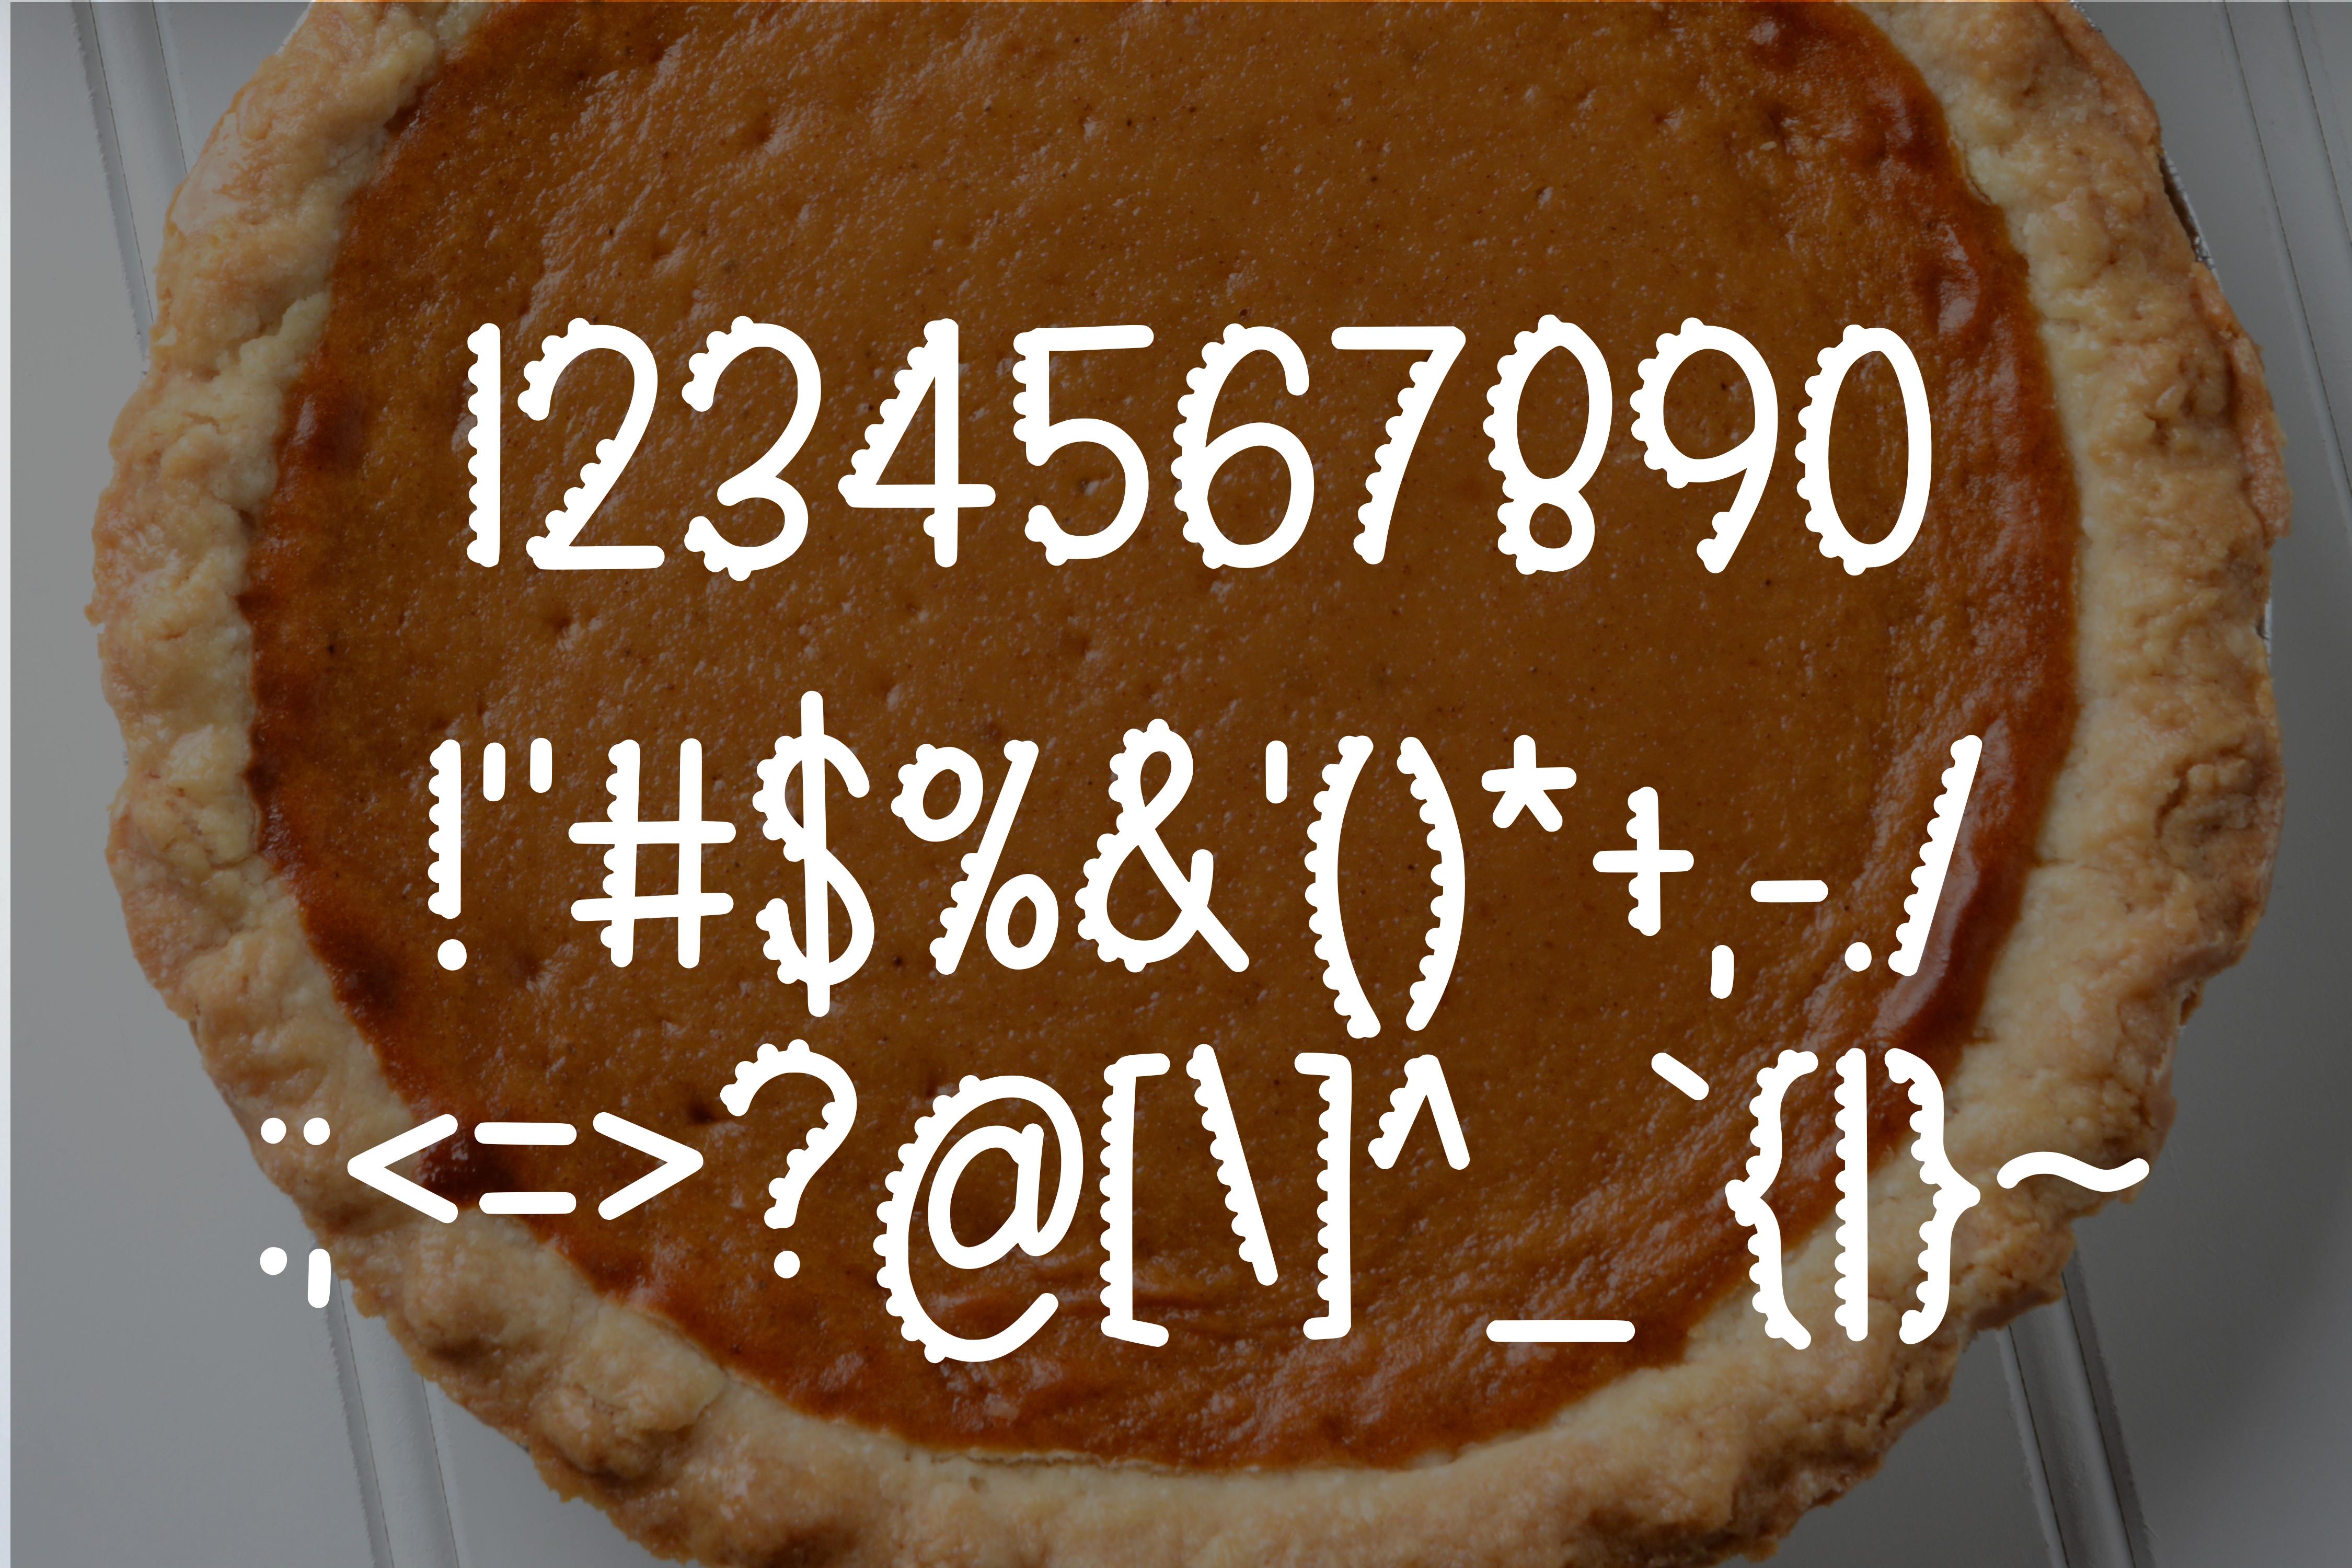 Sweet Pumpkin Pie example image 3